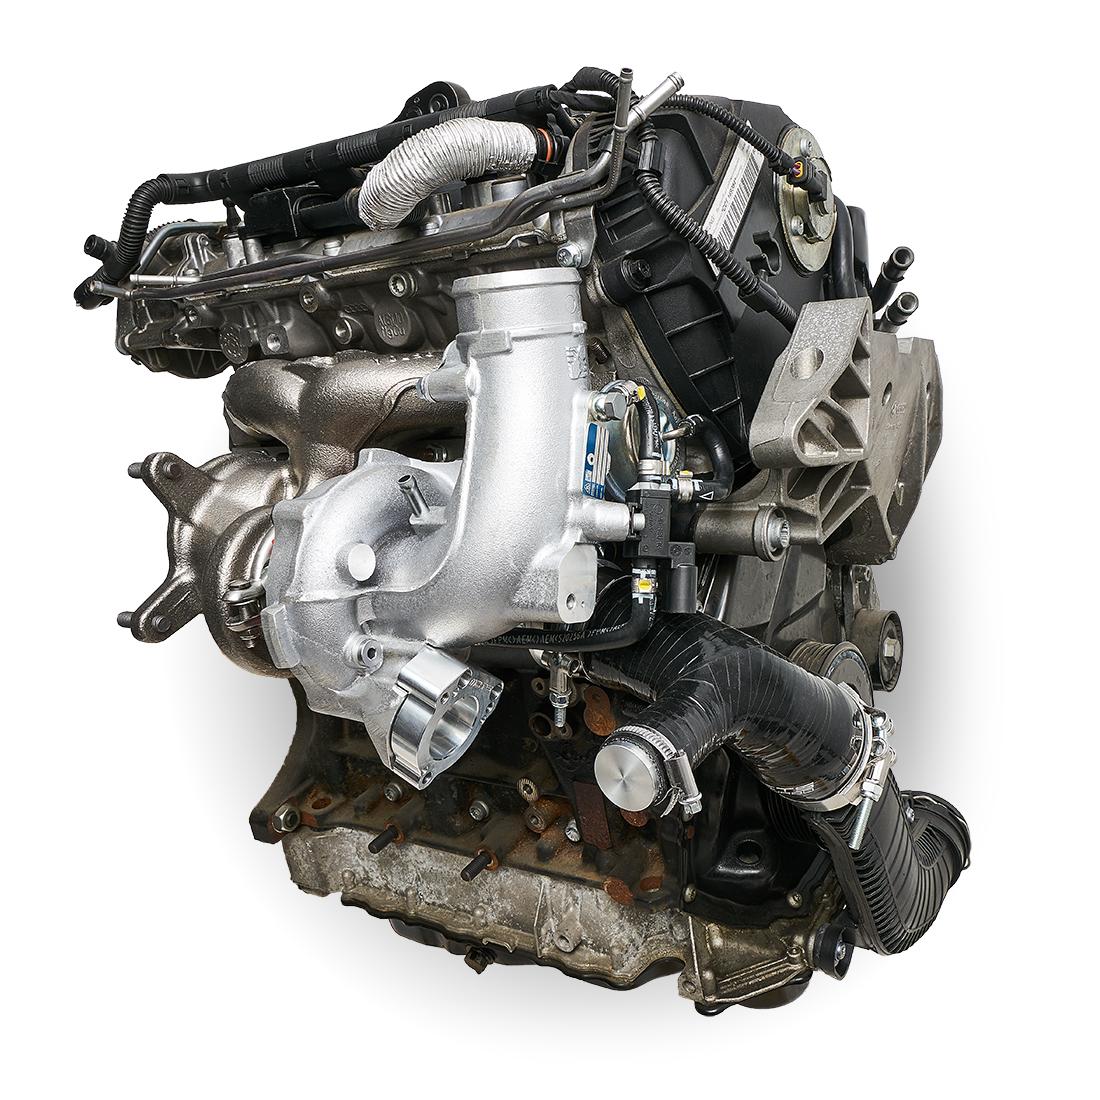 CTS Turbo MK5 2 0 TSI BorgWarner K04 Turbo Upgrade Kit